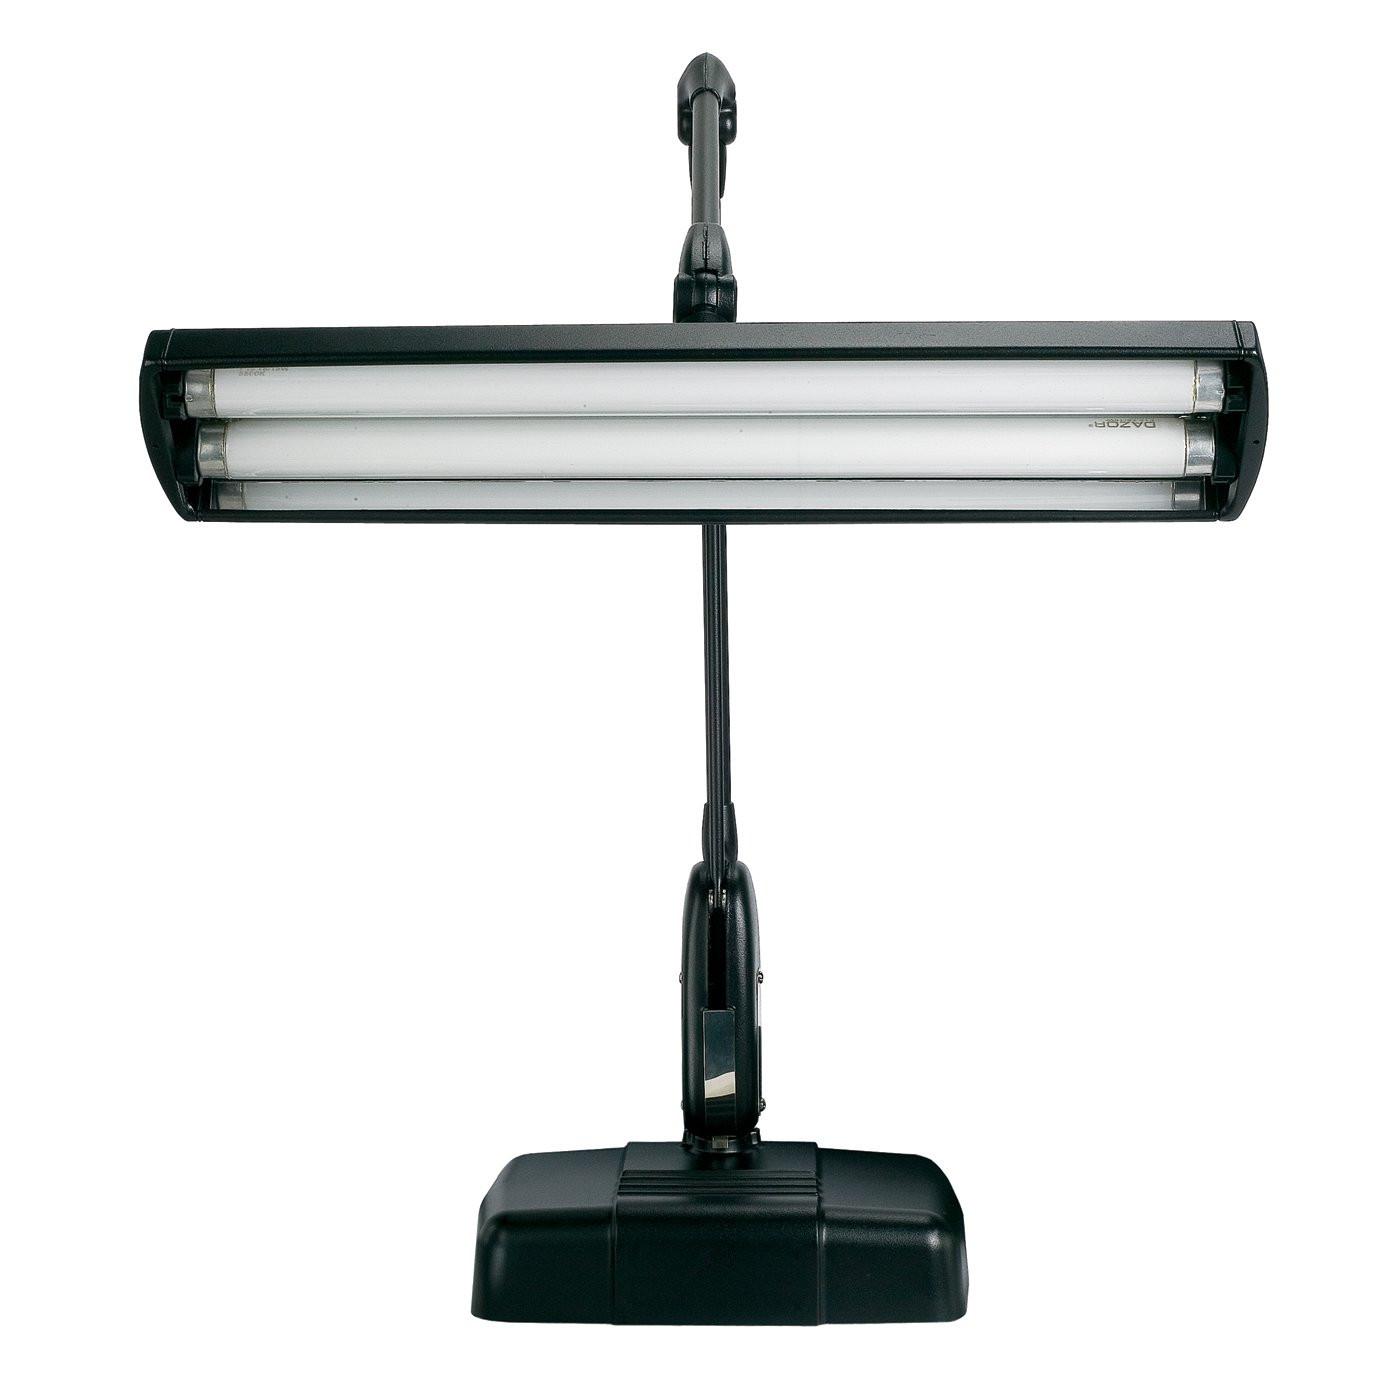 Best ideas about Florescent Desk Lamps . Save or Pin Fluorescent Desk Lamp Now.